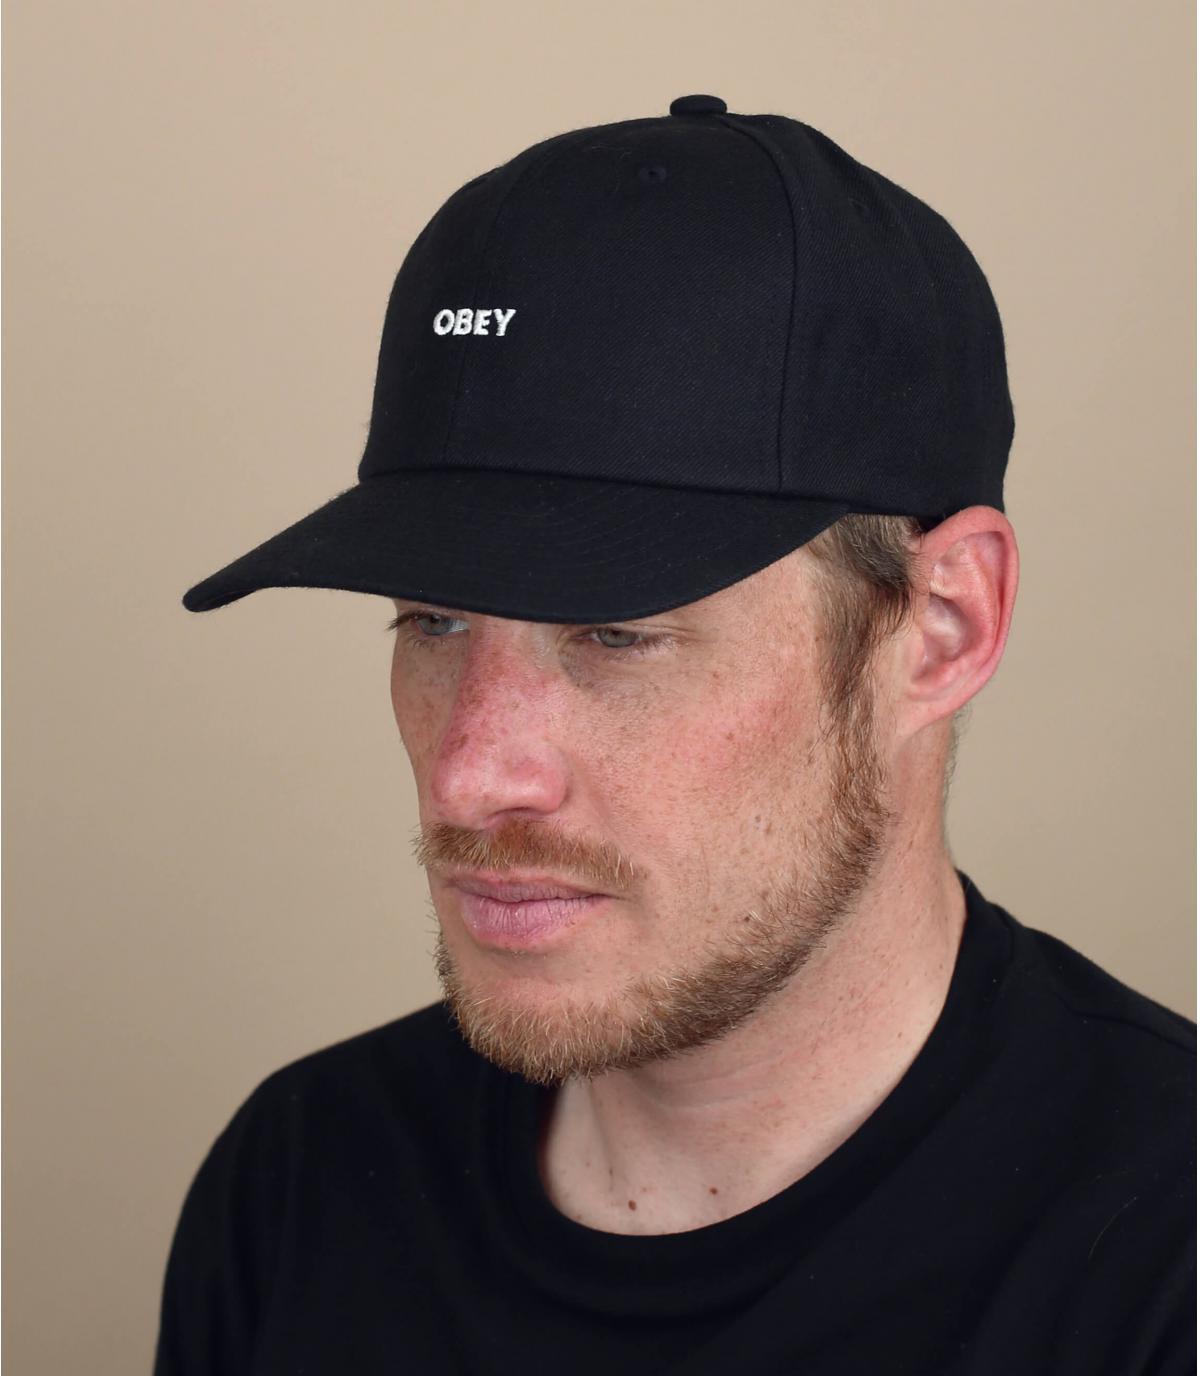 zwarte Obey cap